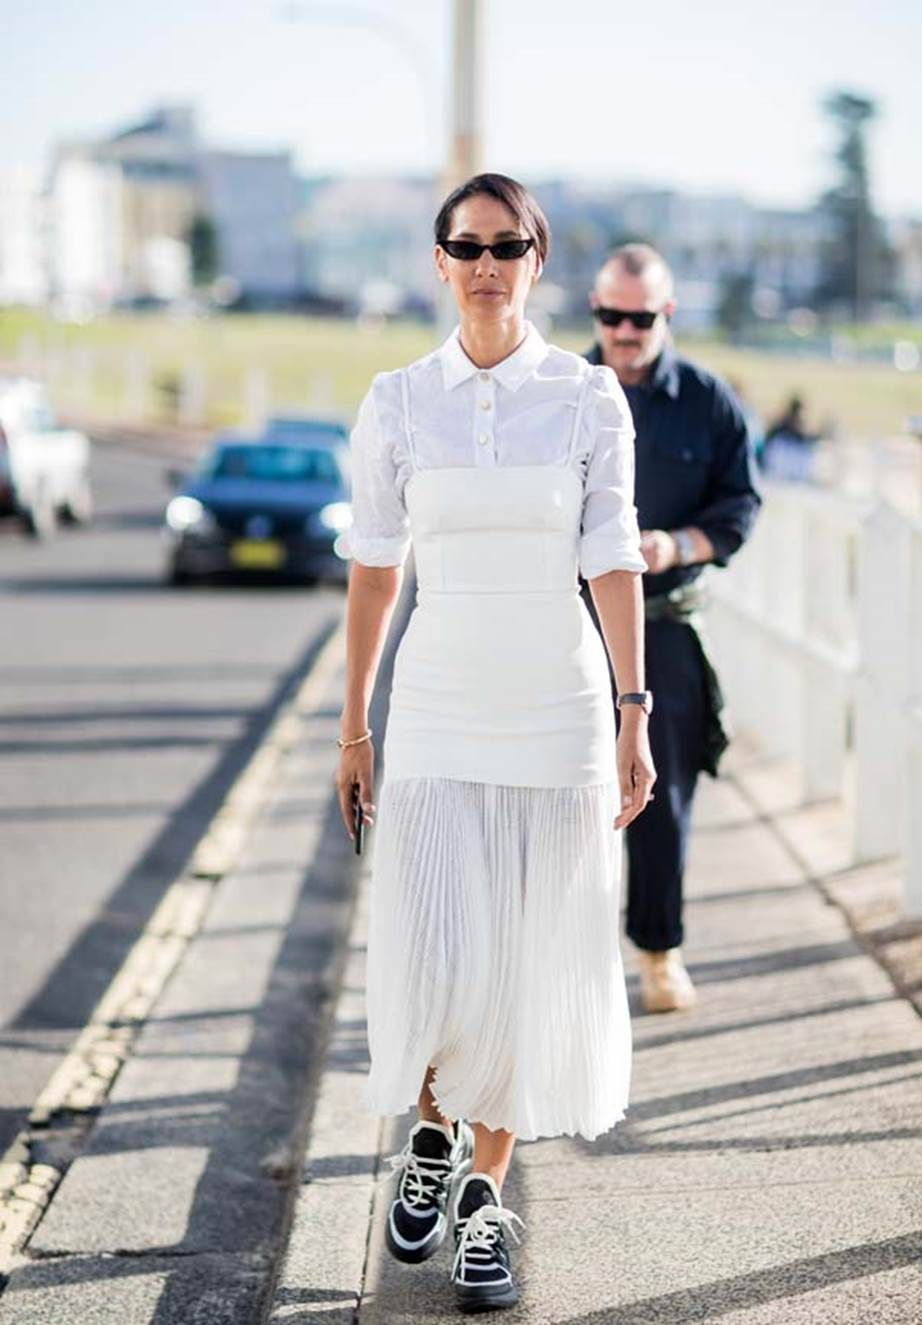 Tendencias de moda 2019 das passarelas para o dia a dia